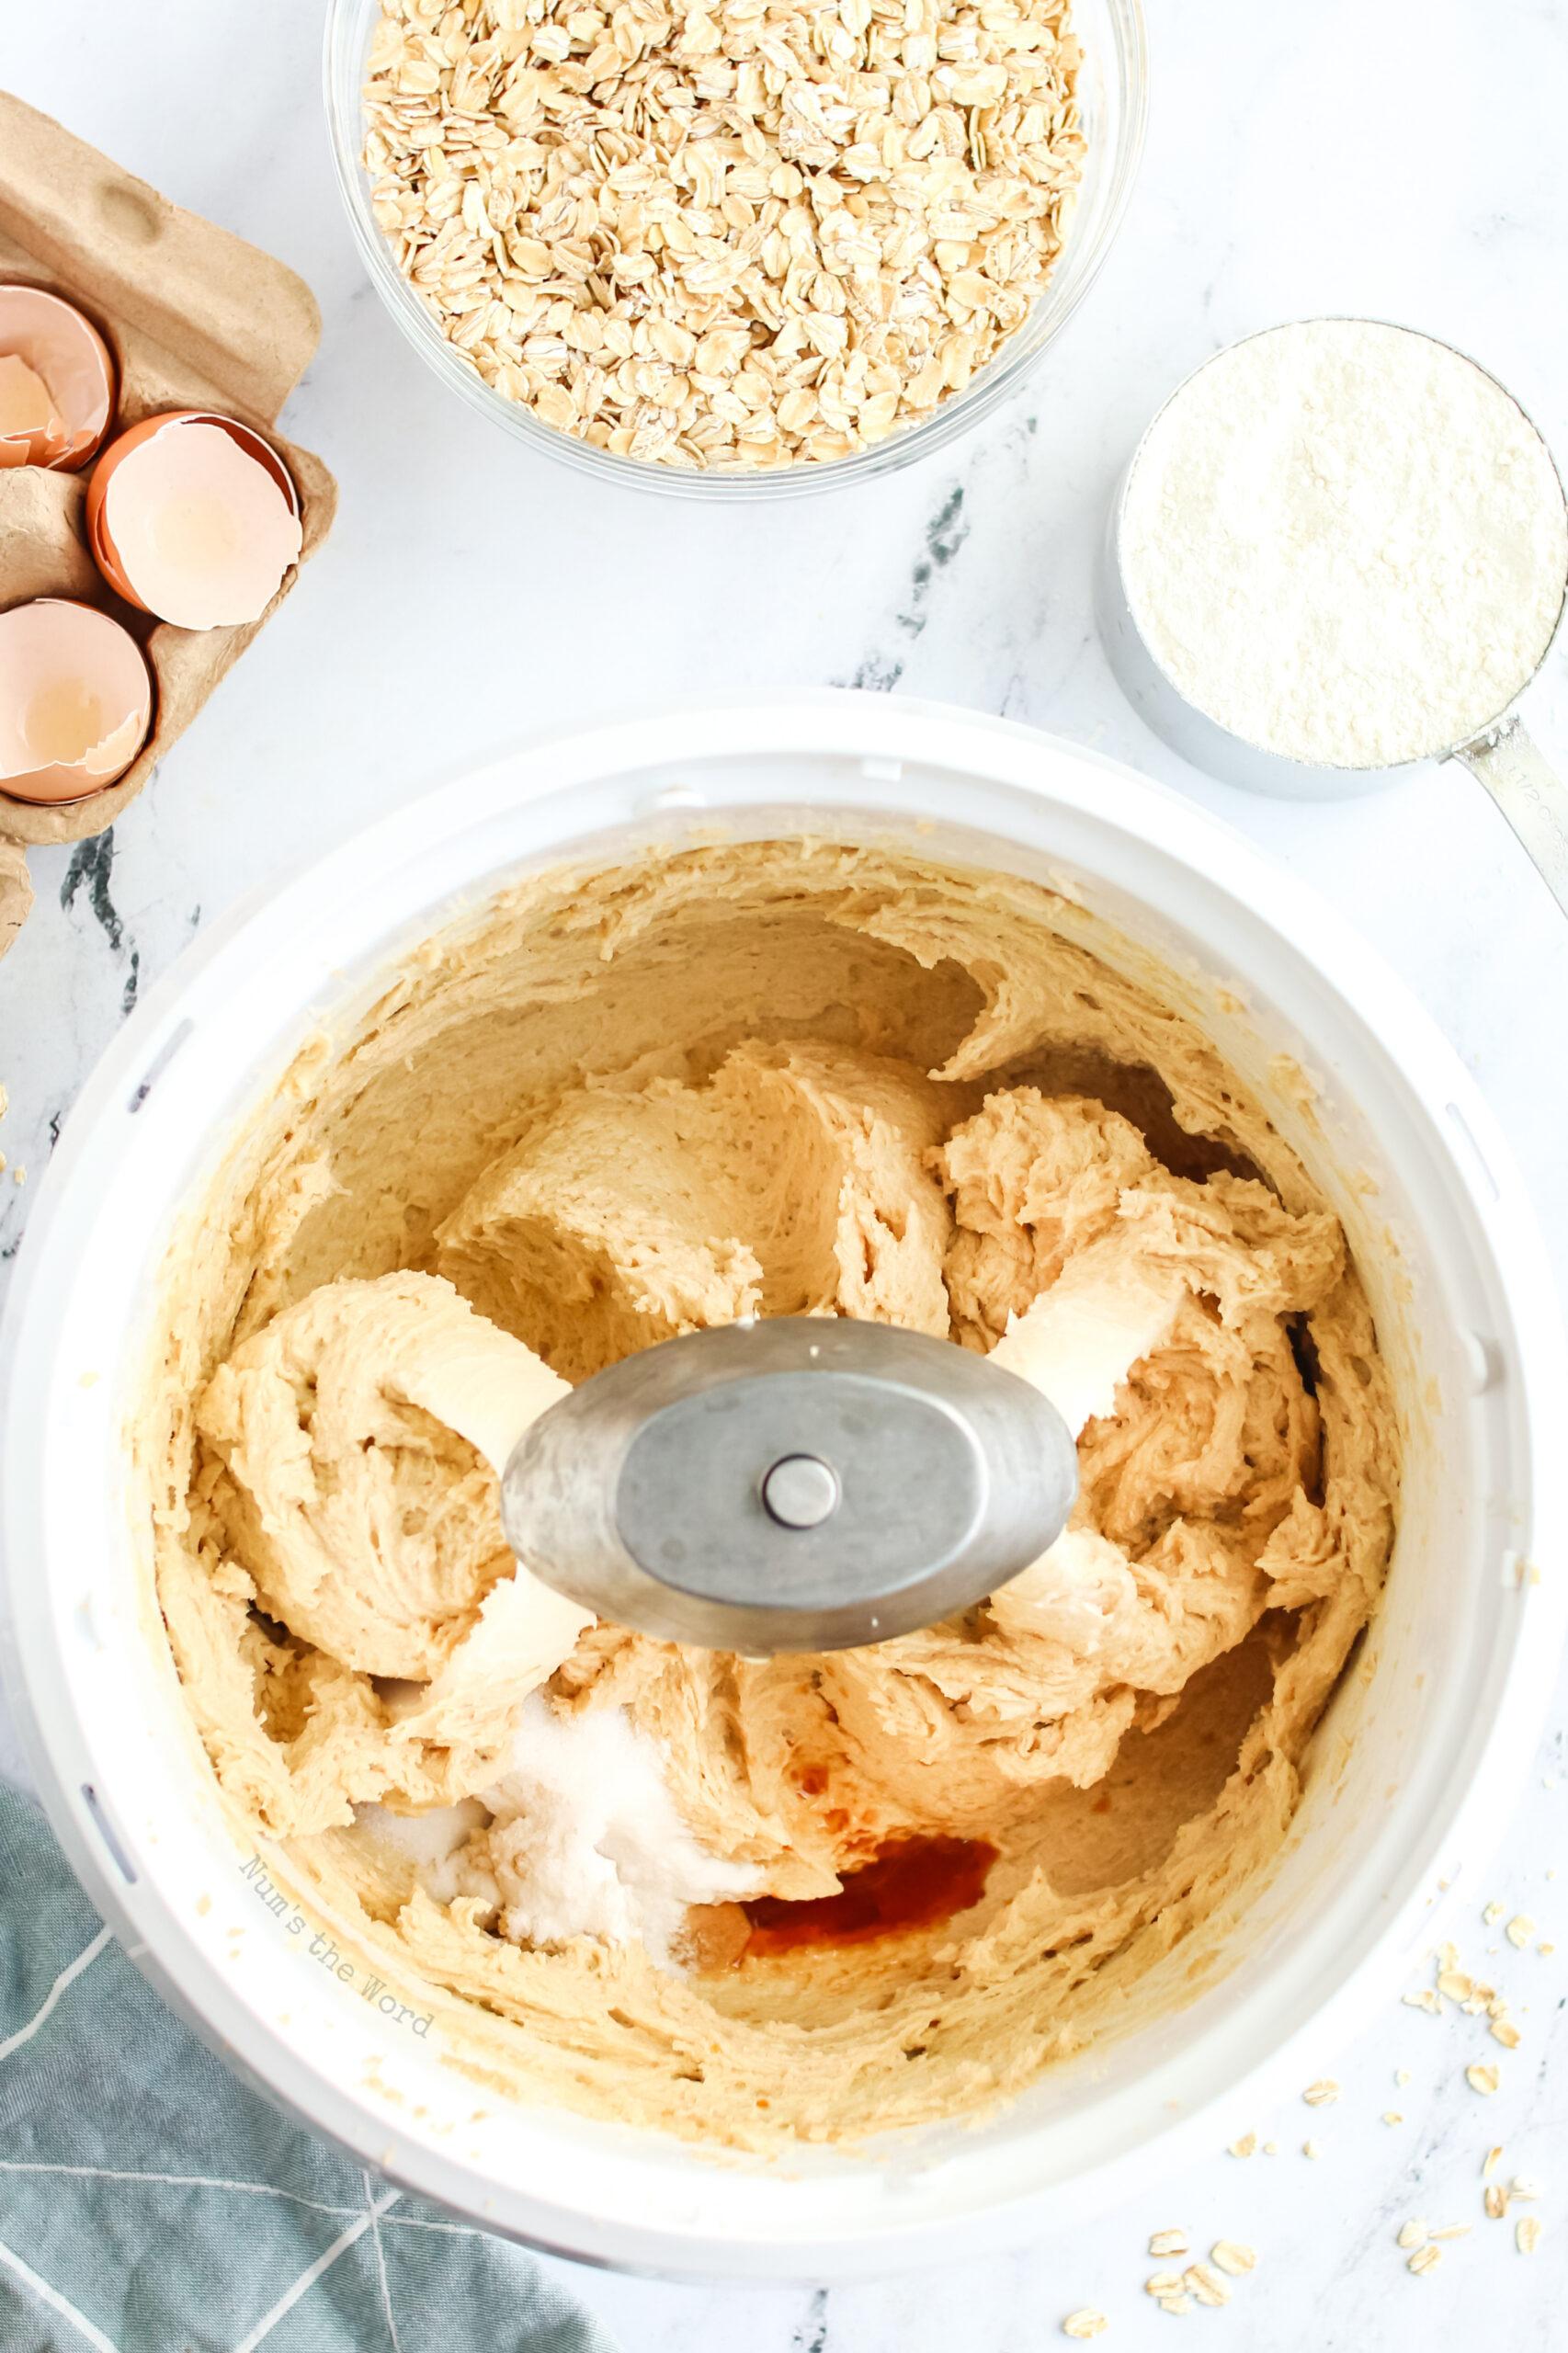 Vanilla, baking soda and salt added to mixer bowl.